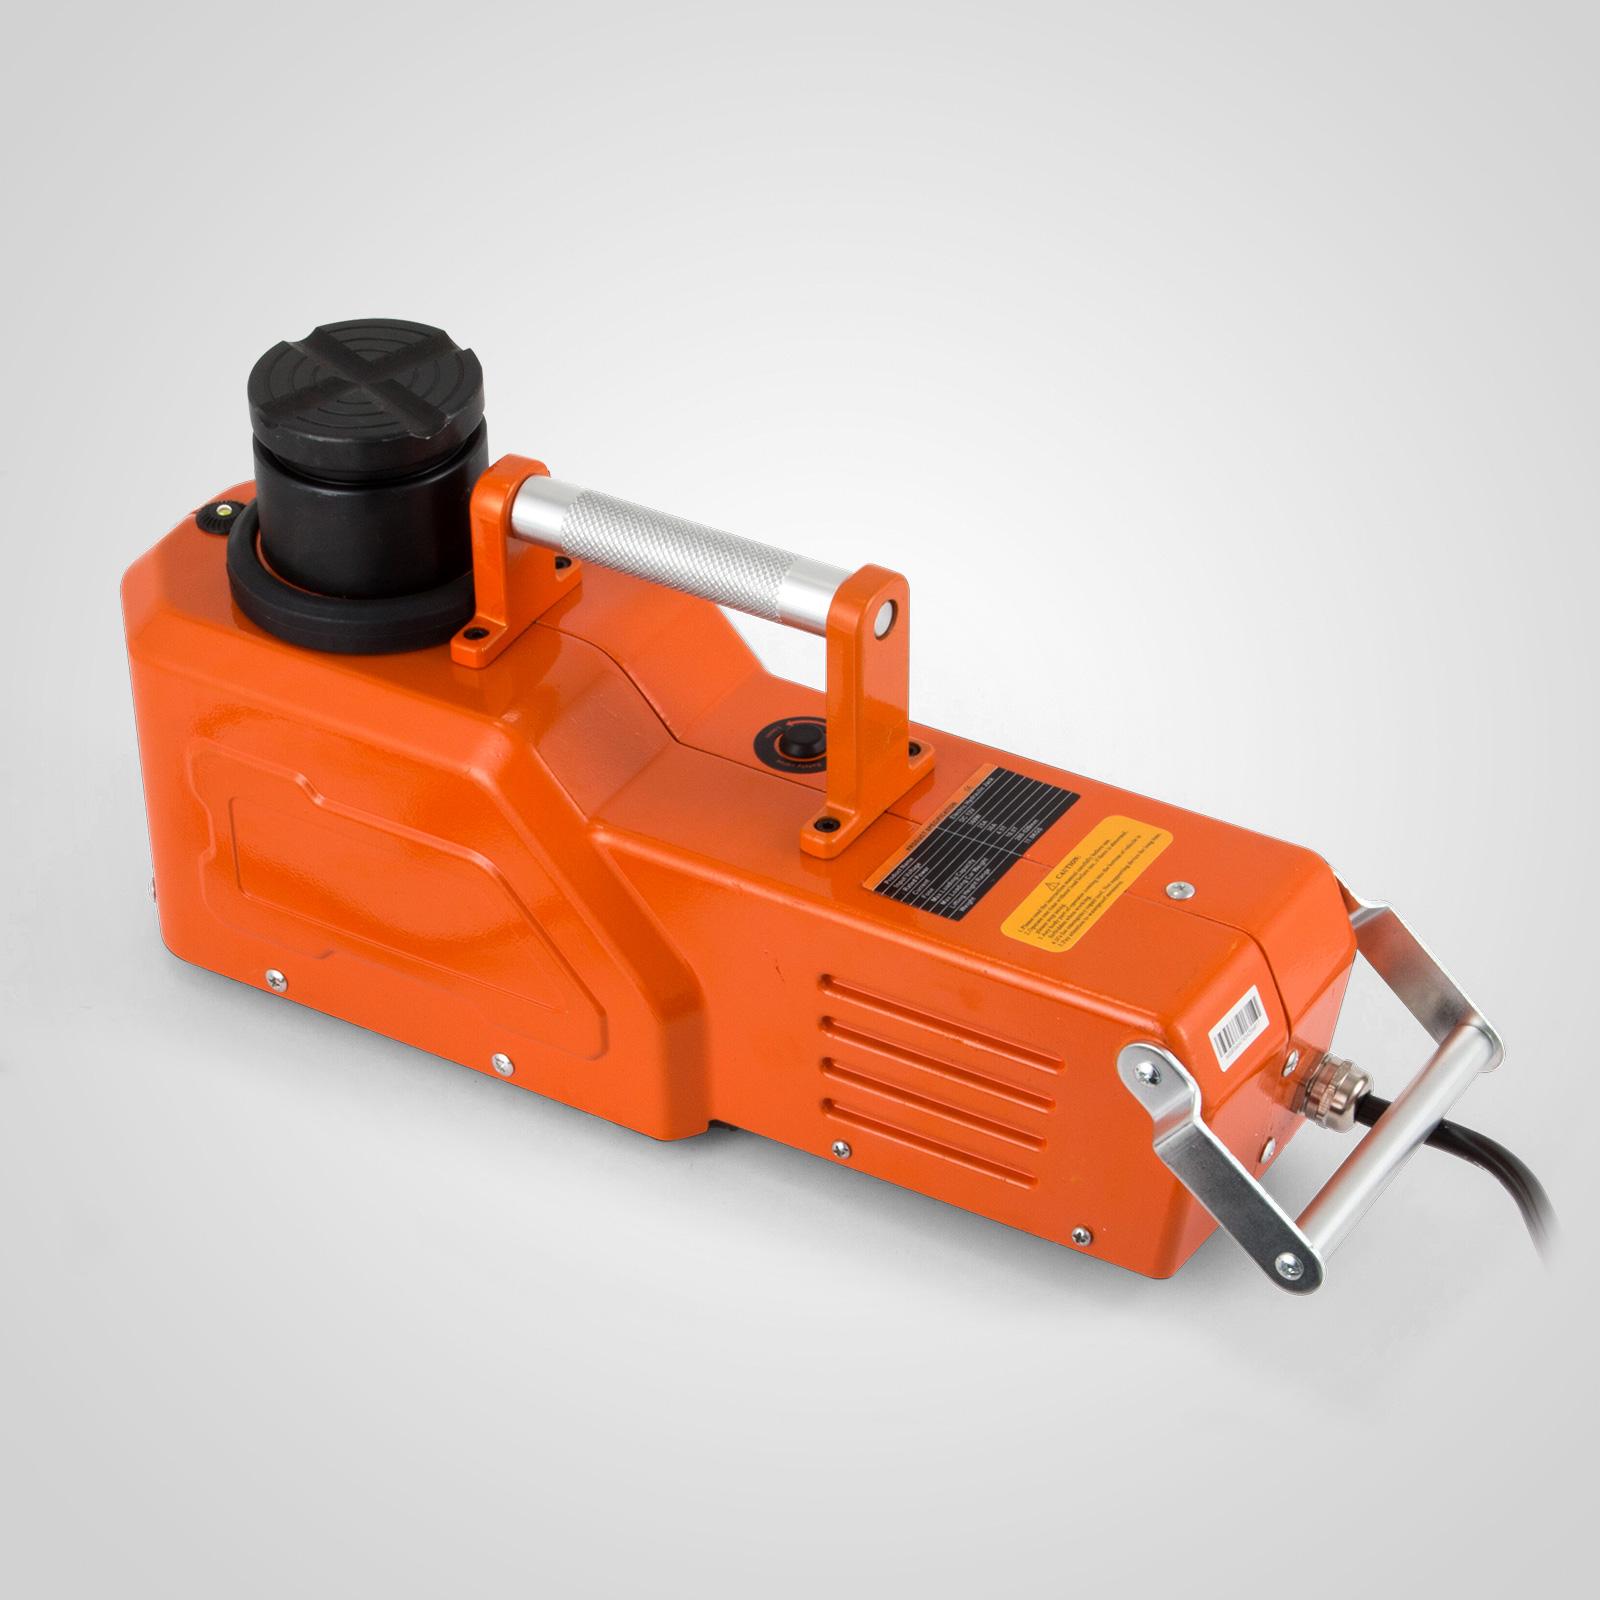 12V Hydraulic Floor Jack Electric Car Lift 9900lbs Adjustable 4.5T  Car Use